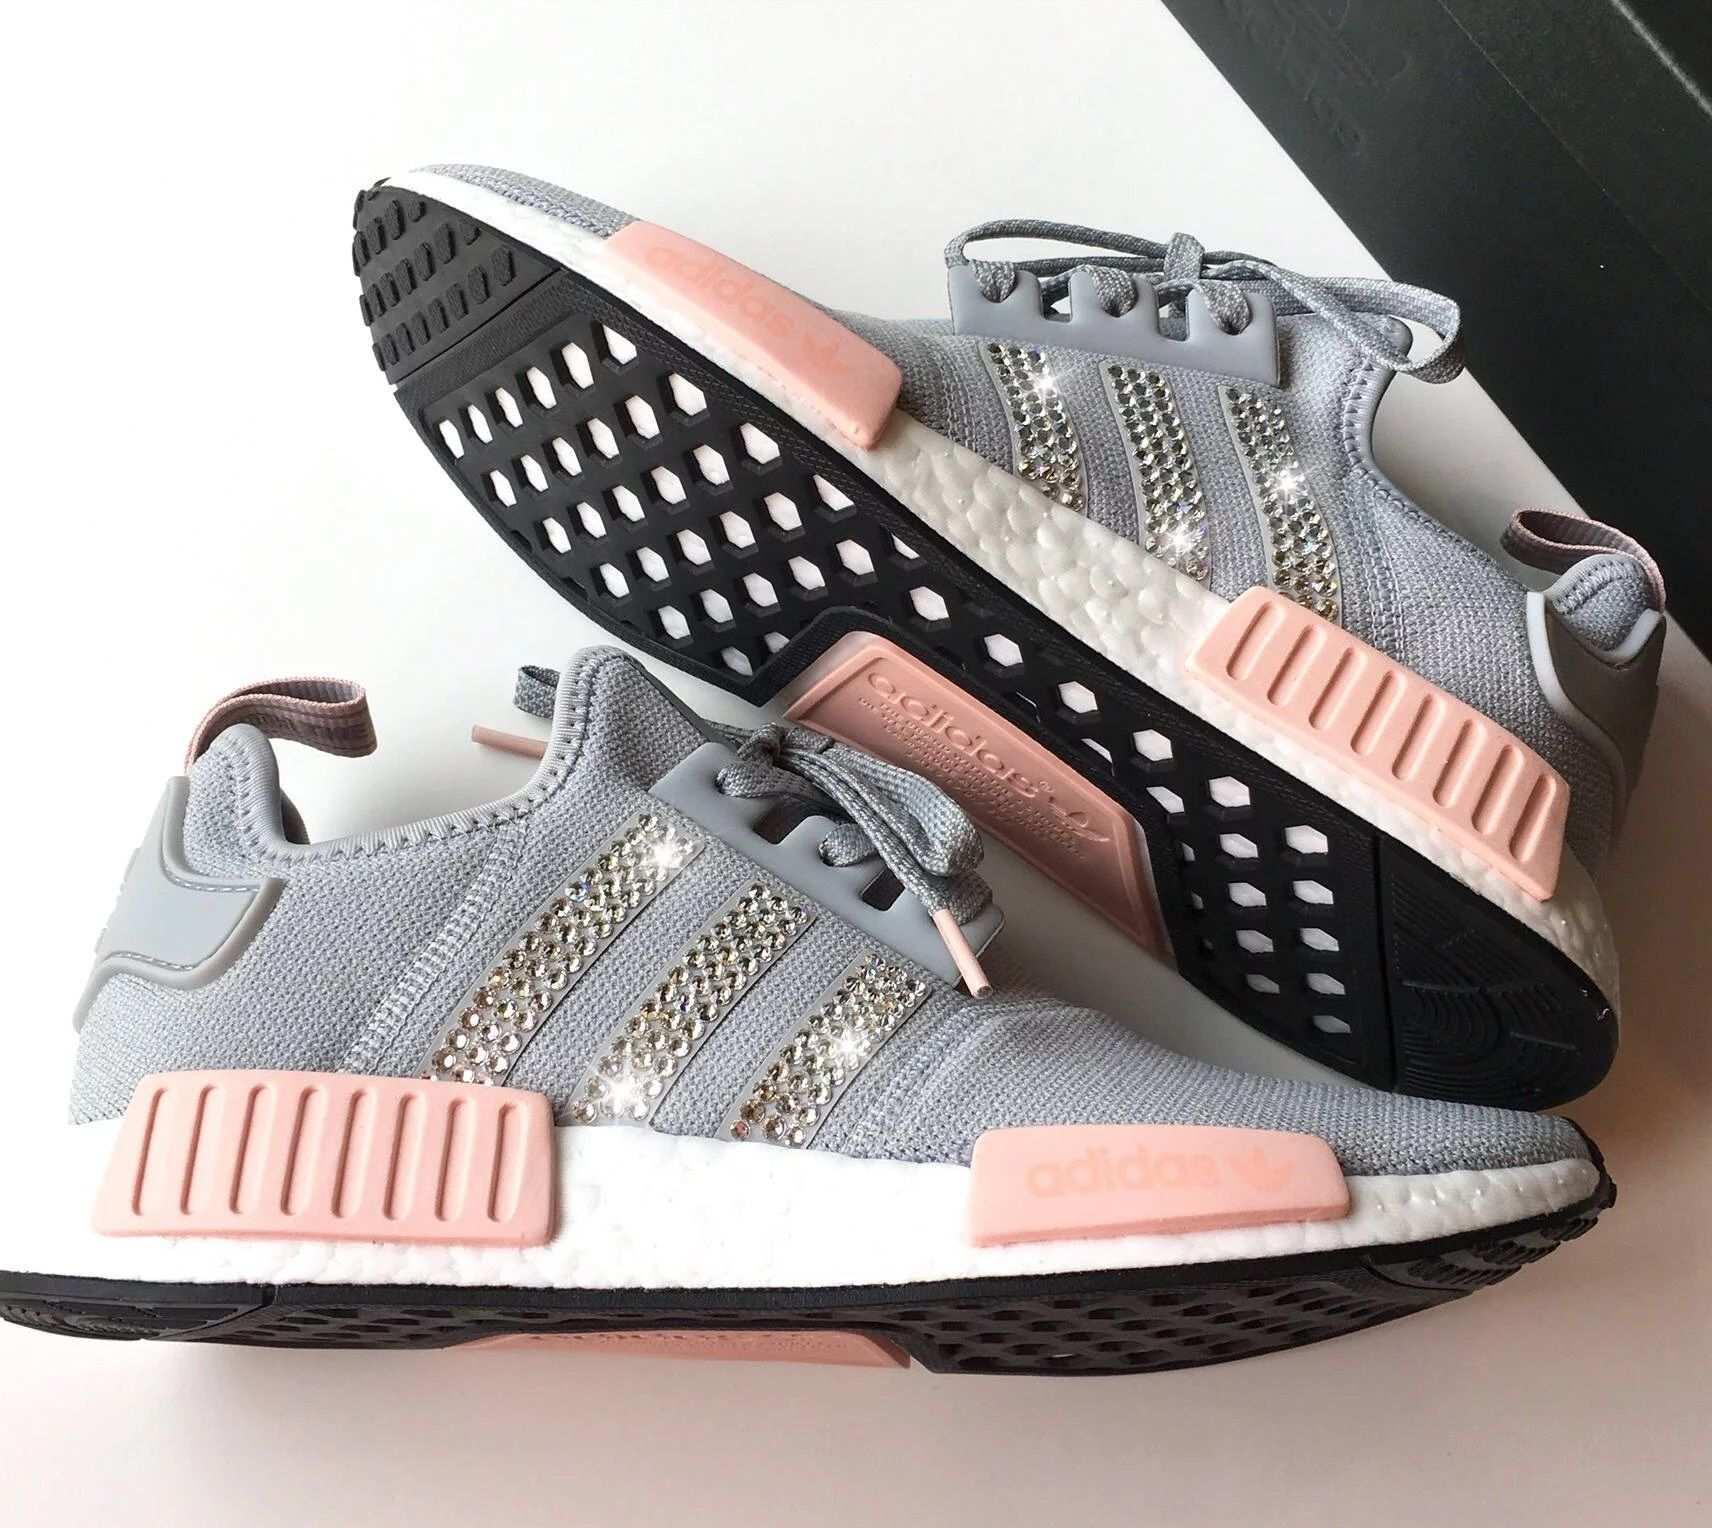 Adidas Nmd Custom Sneaker Adidas Nmd Pink Adidas Shoes Women Cheap Adidas Nmd